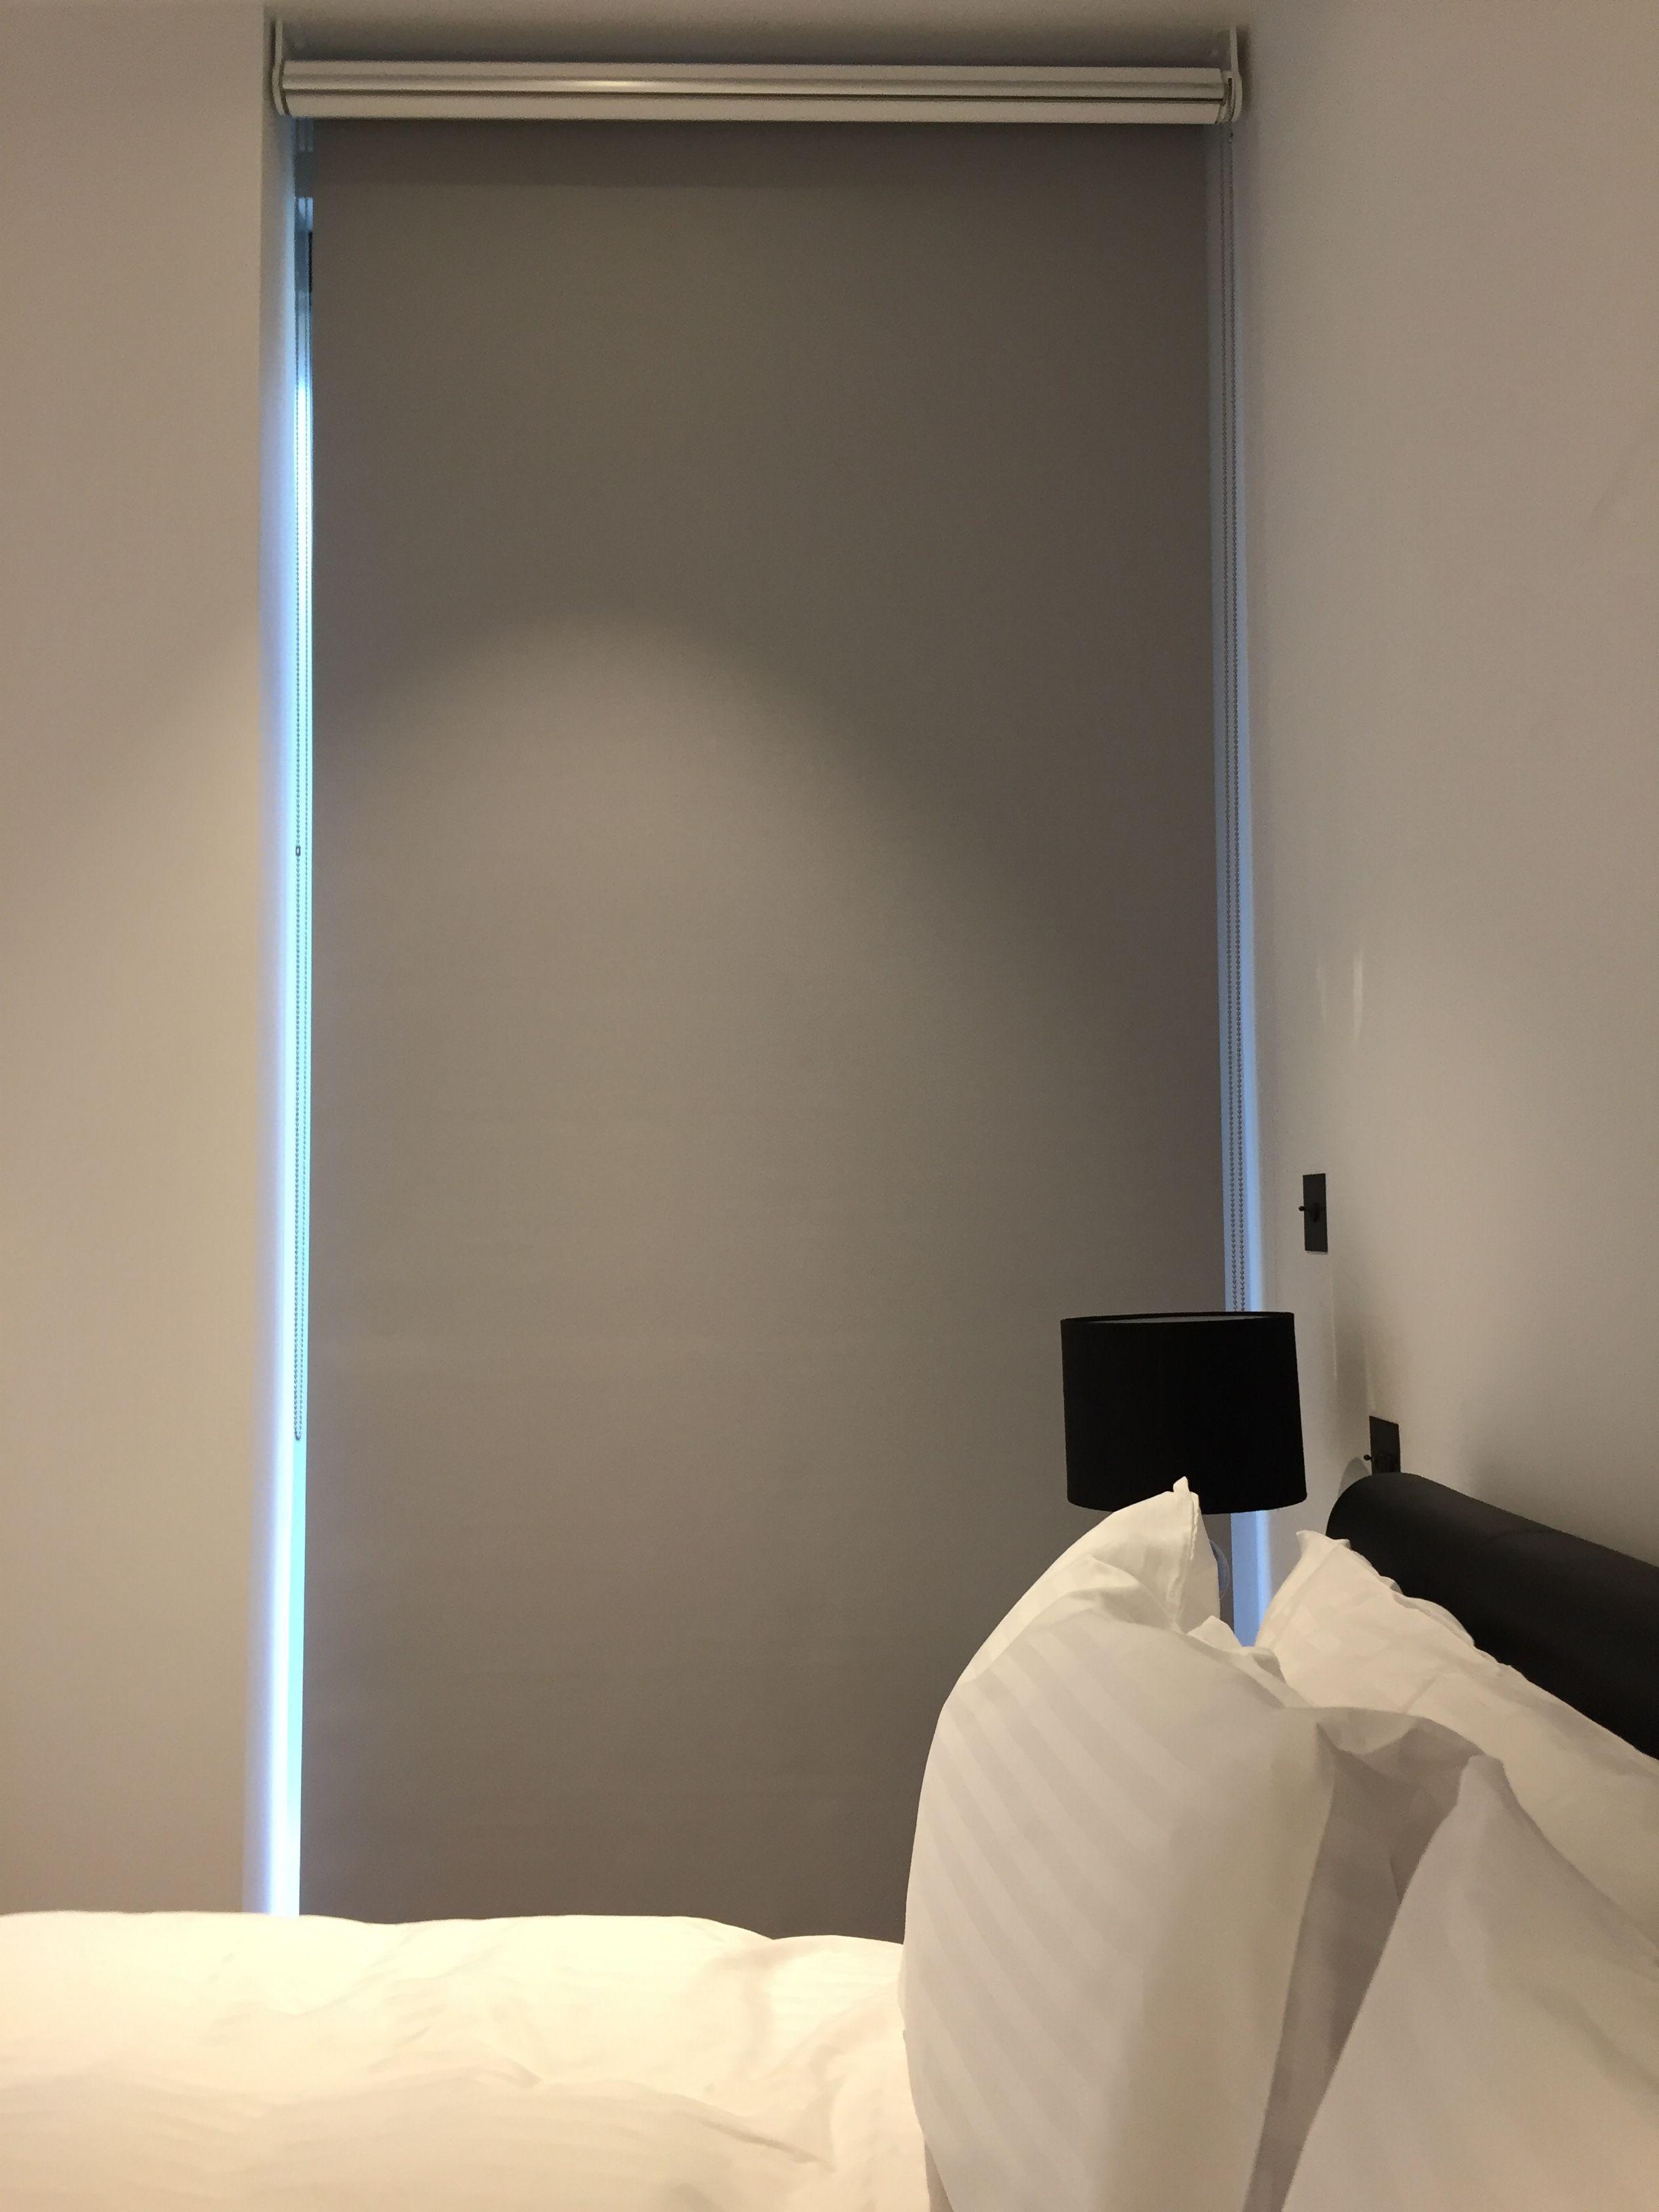 Double/dual Roller Blinds Showing The Blackout Blind Down | Bedroom Blind |  Blind For